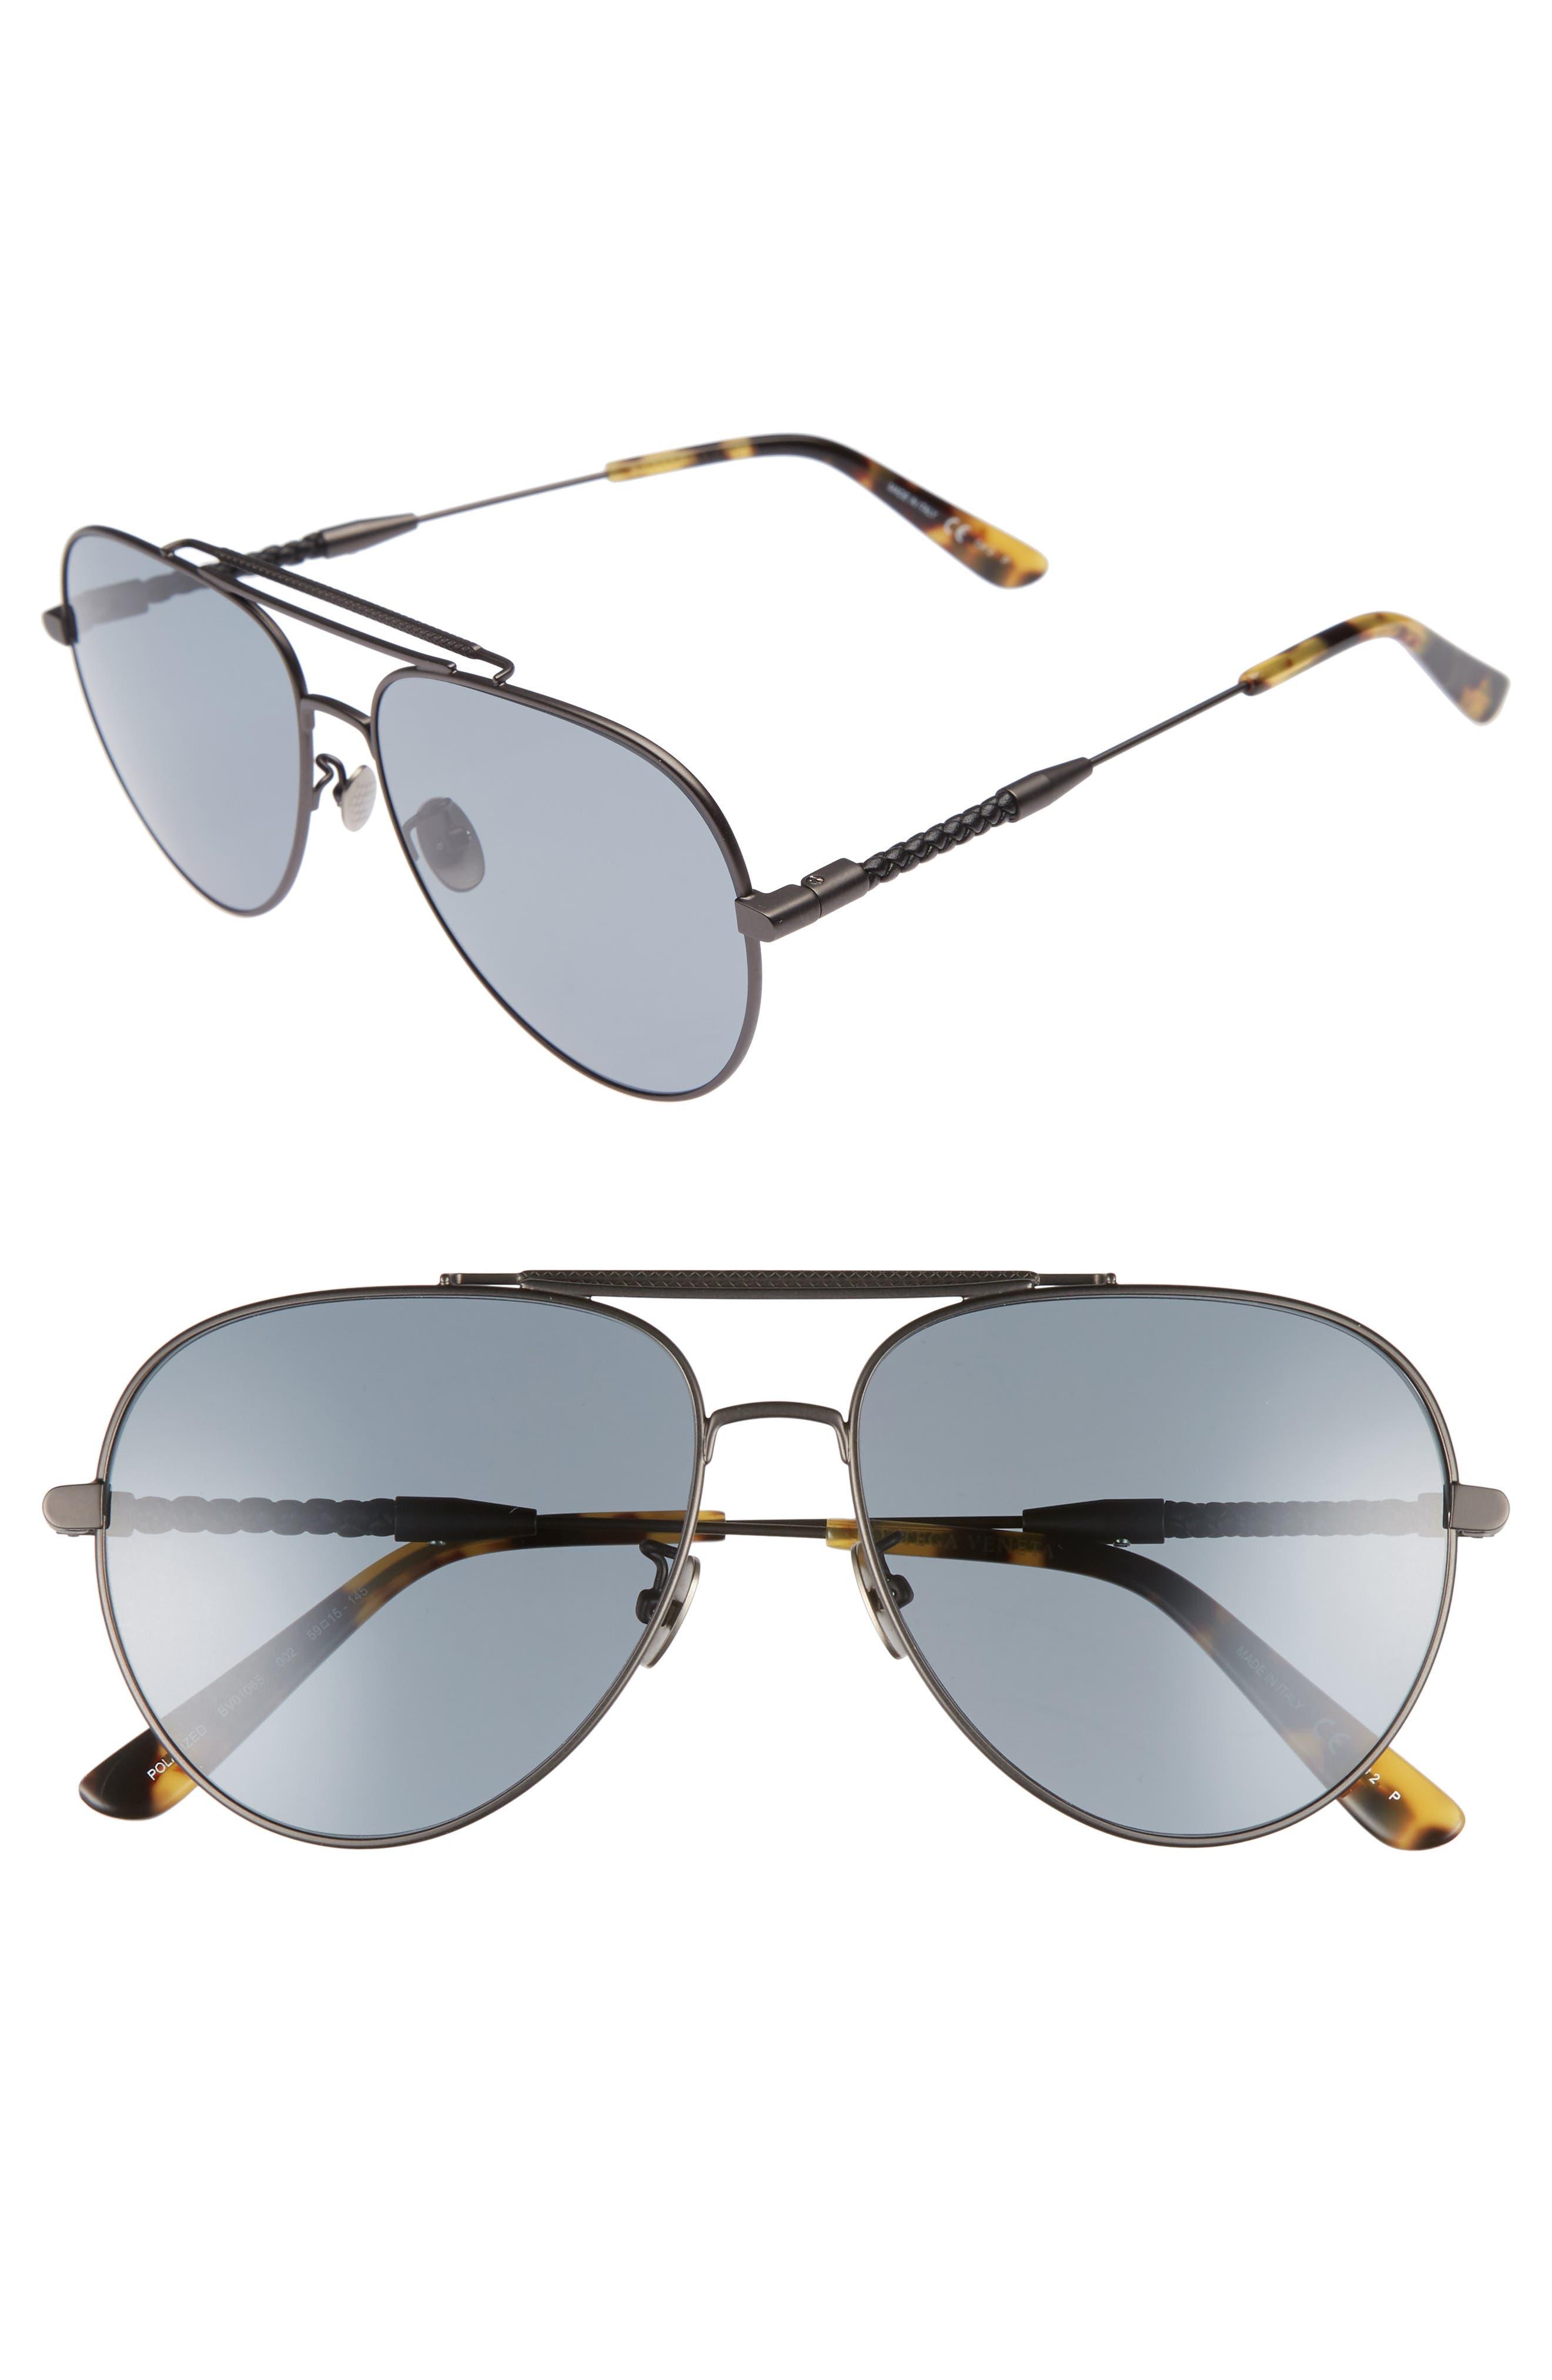 59m Polarized Aviator Sunglasses,                             Main thumbnail 1, color,